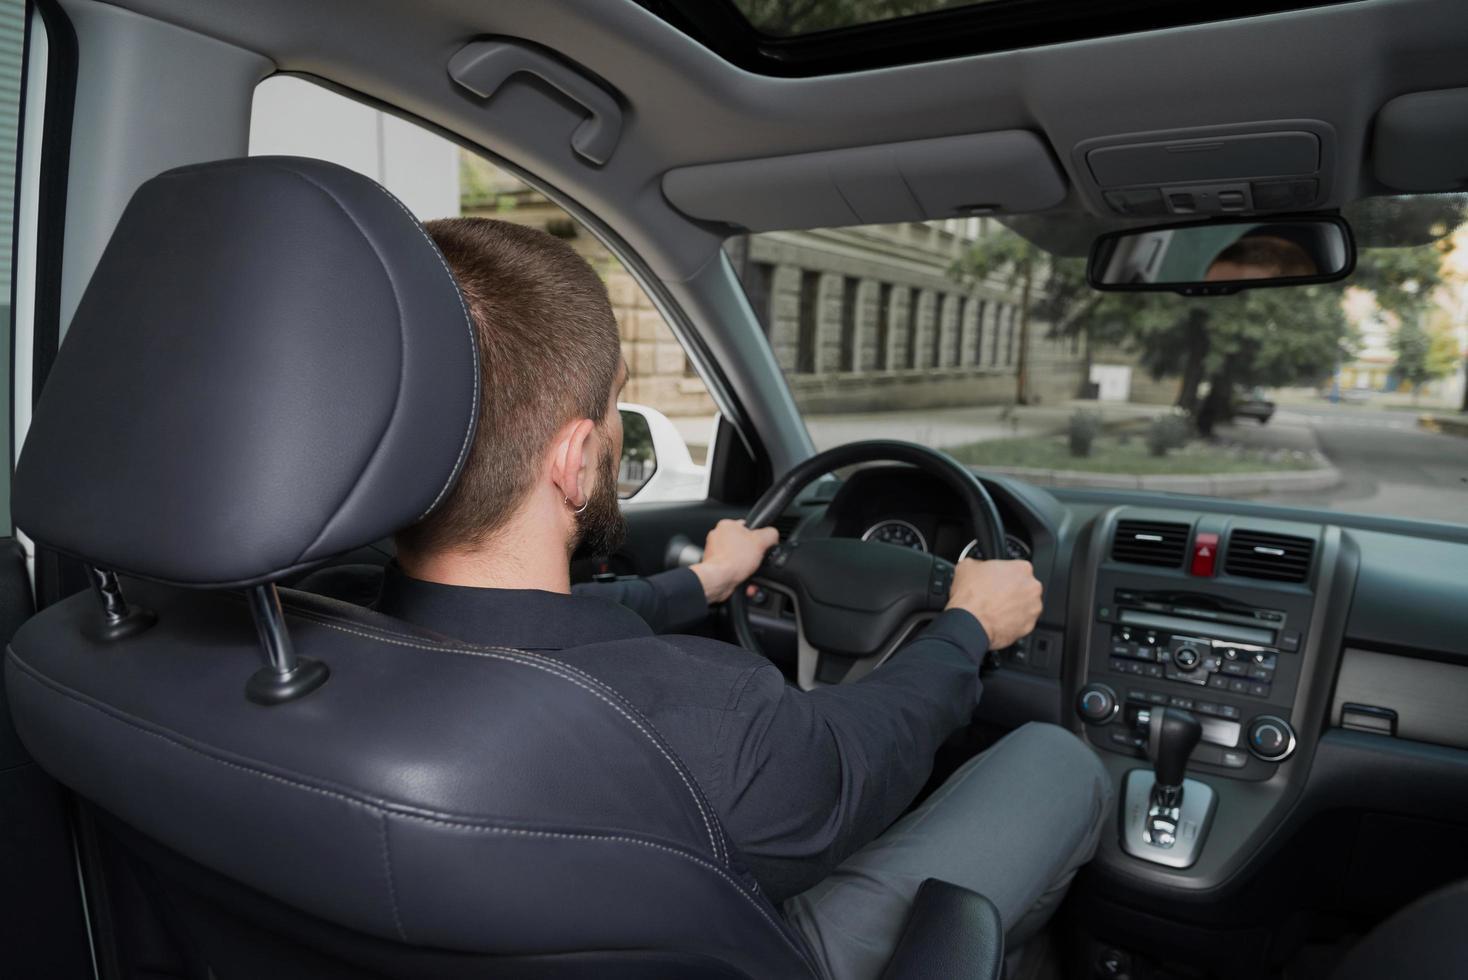 man rijdende auto foto